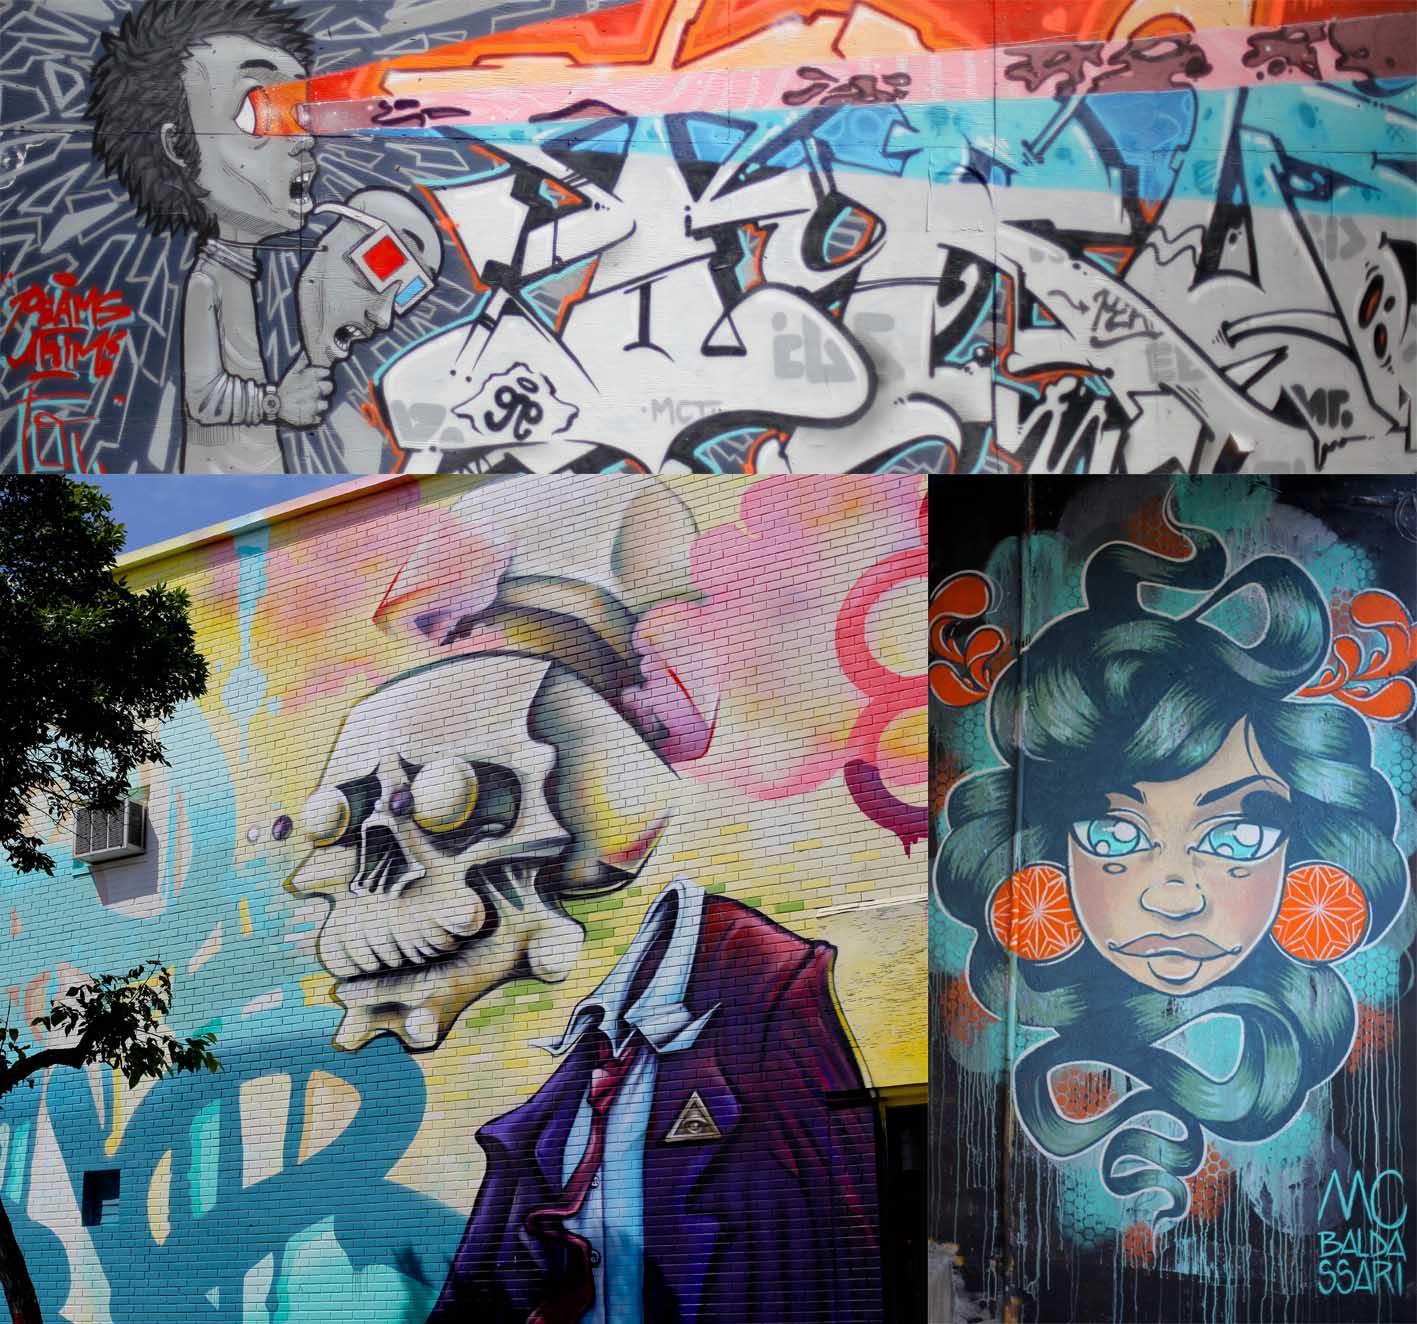 Graff montréal 1